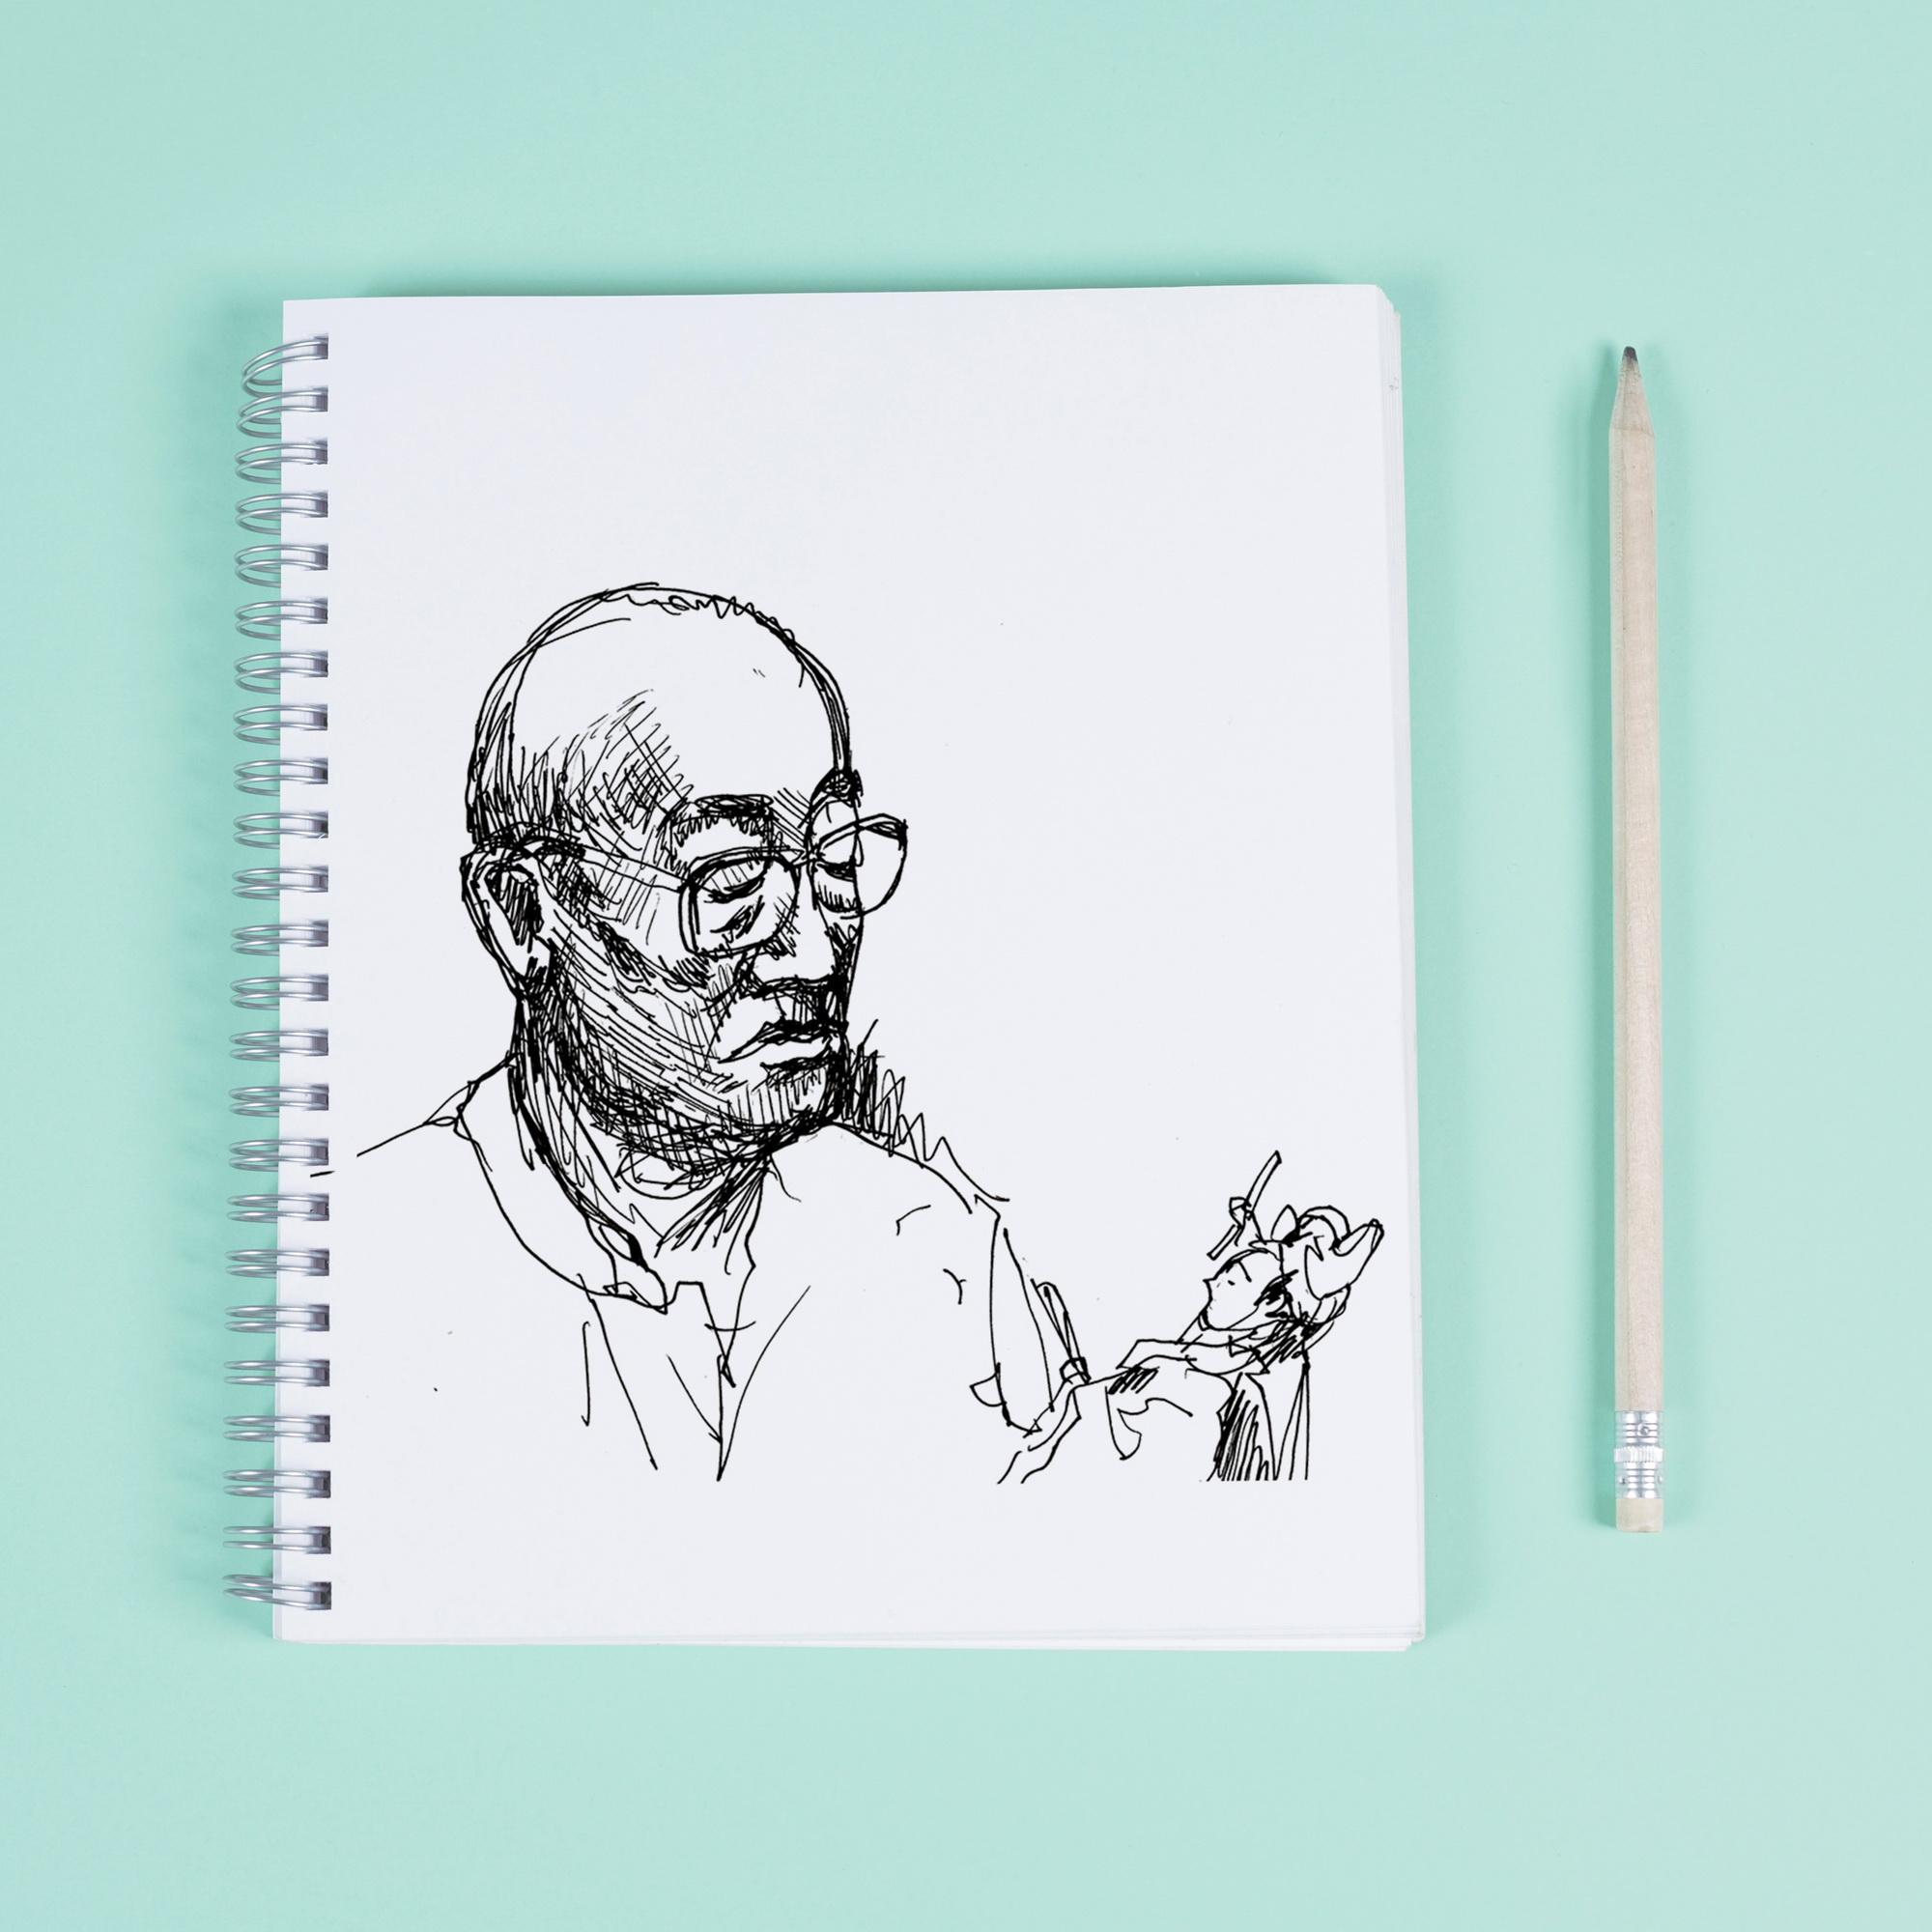 INK LINE DRAW